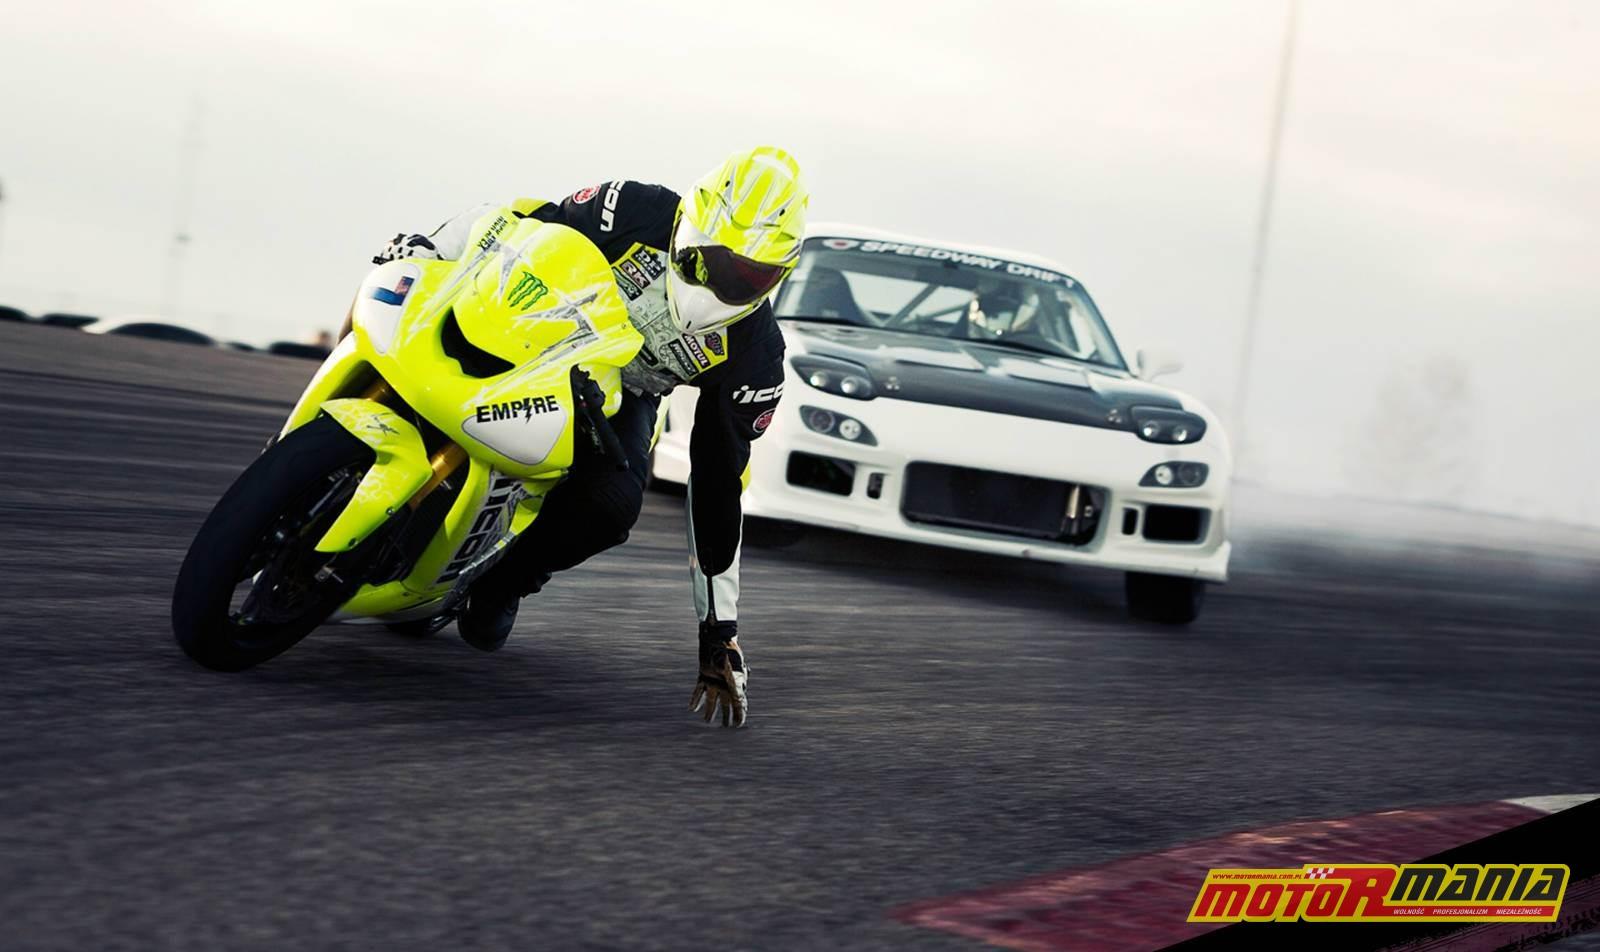 motocykl kontra samochod